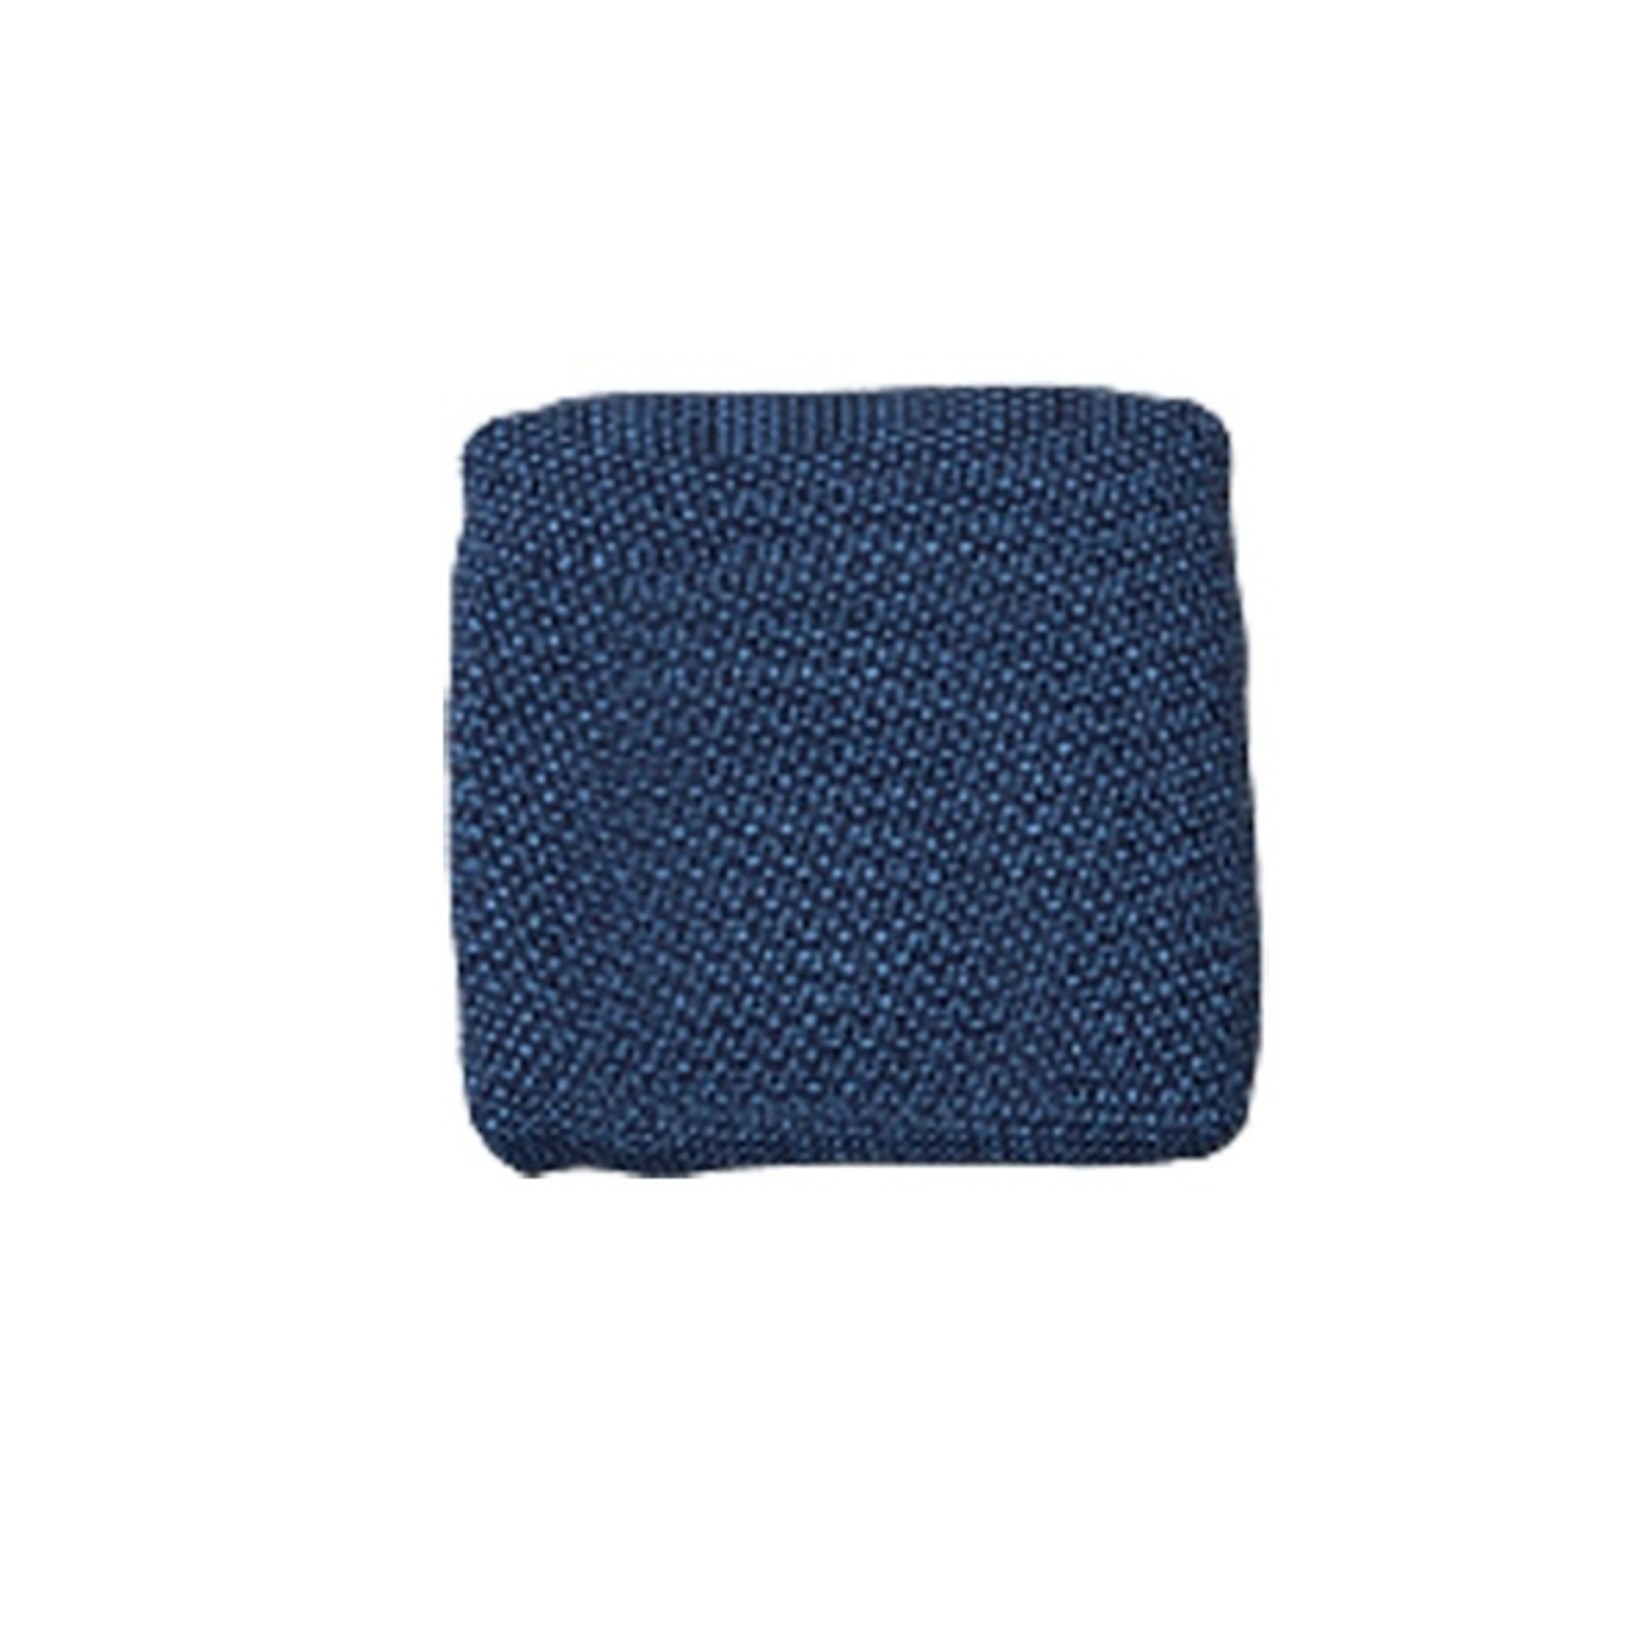 Vondom Suave Cushion 50x50